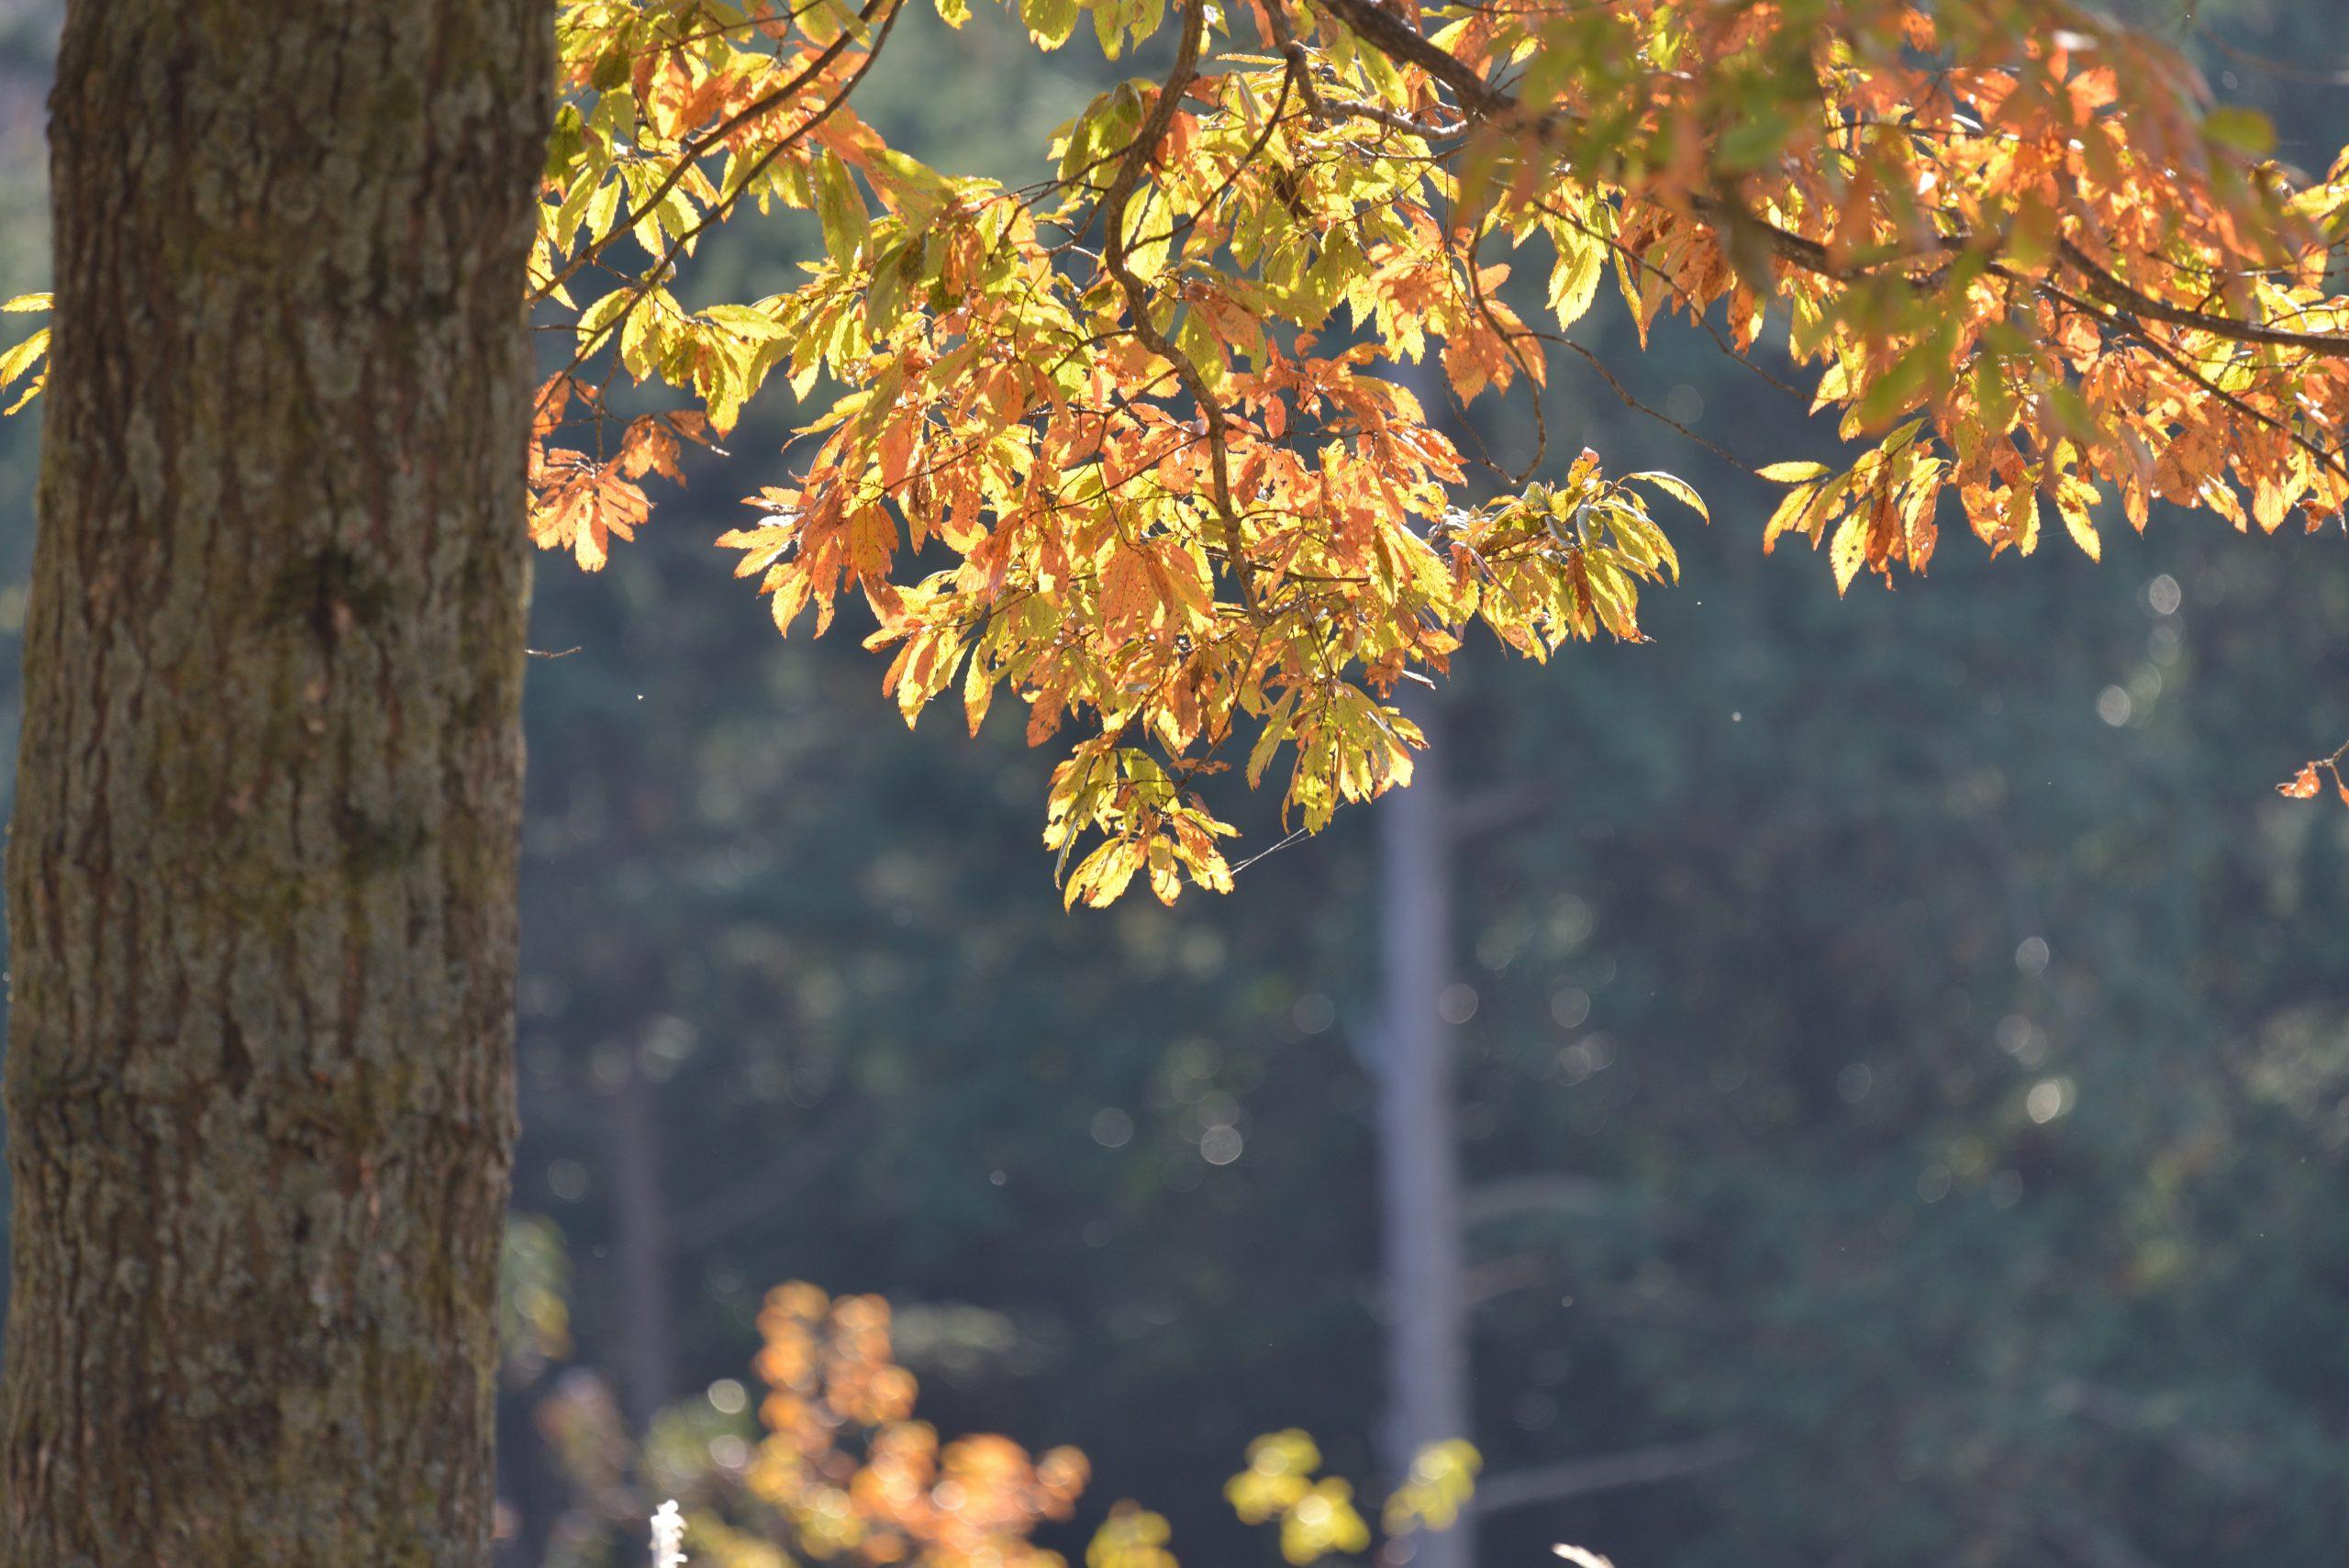 【Nikon】望遠レンズで見た12月の風景